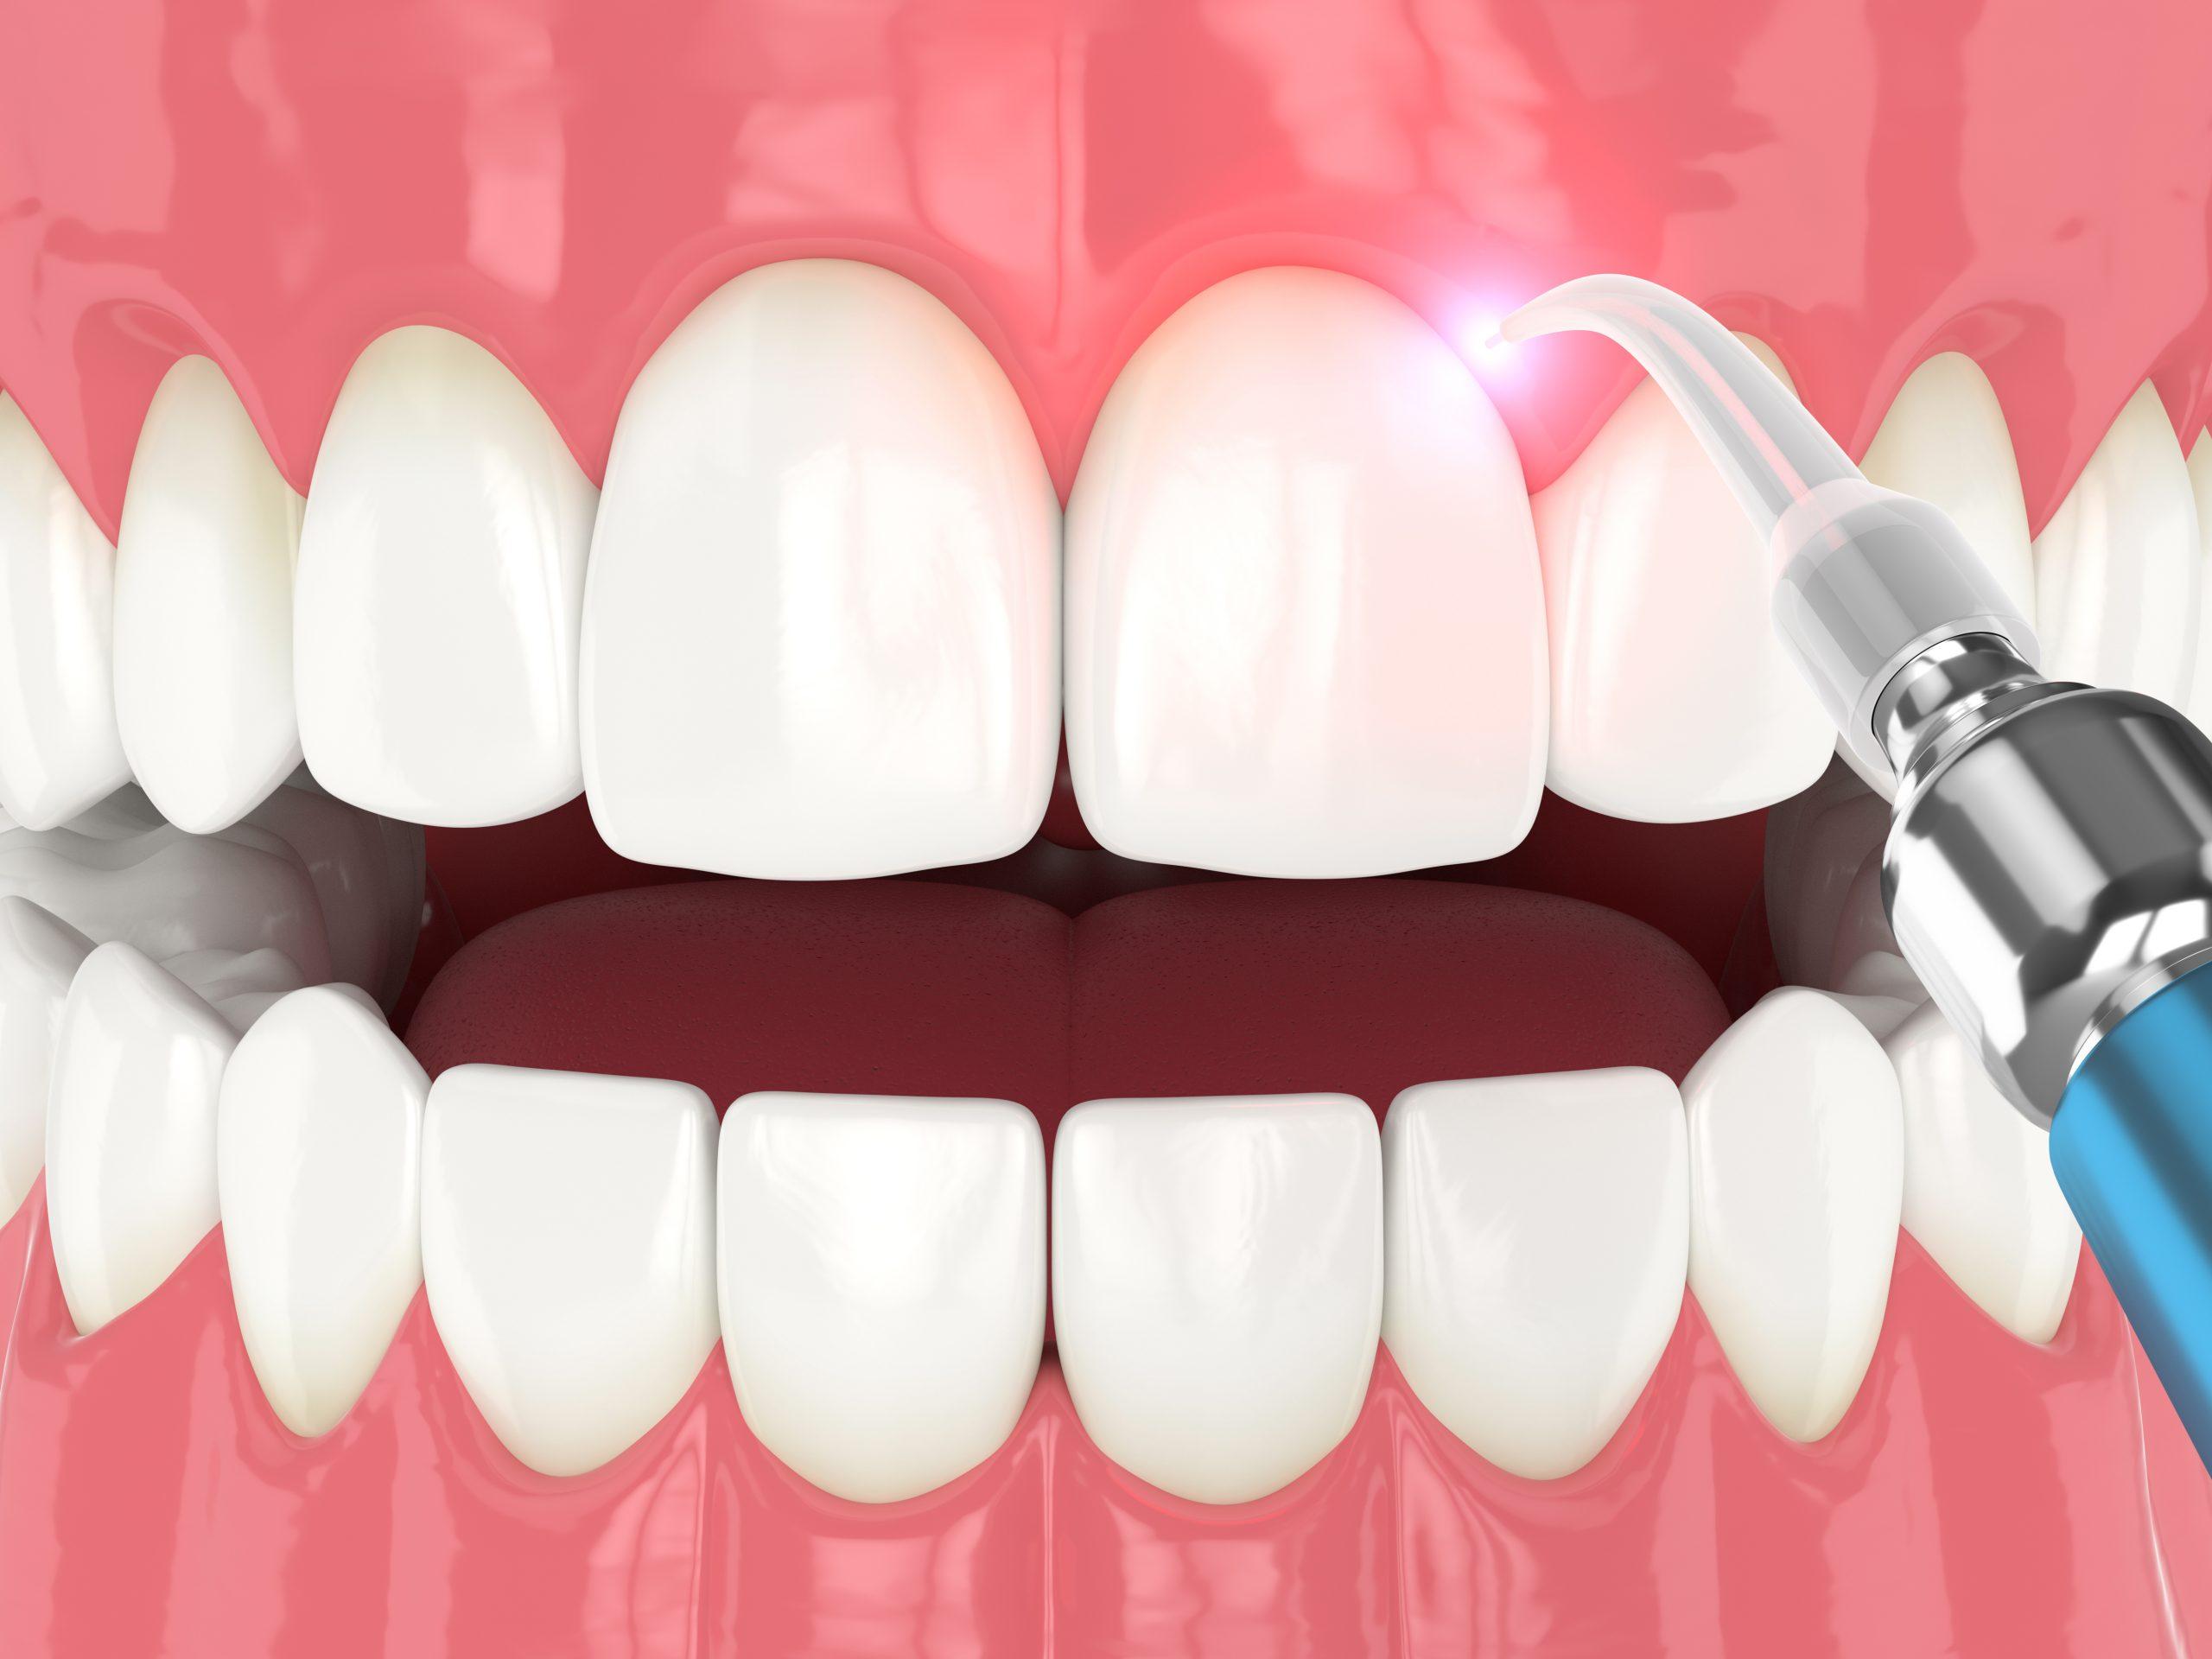 syosset dental technology